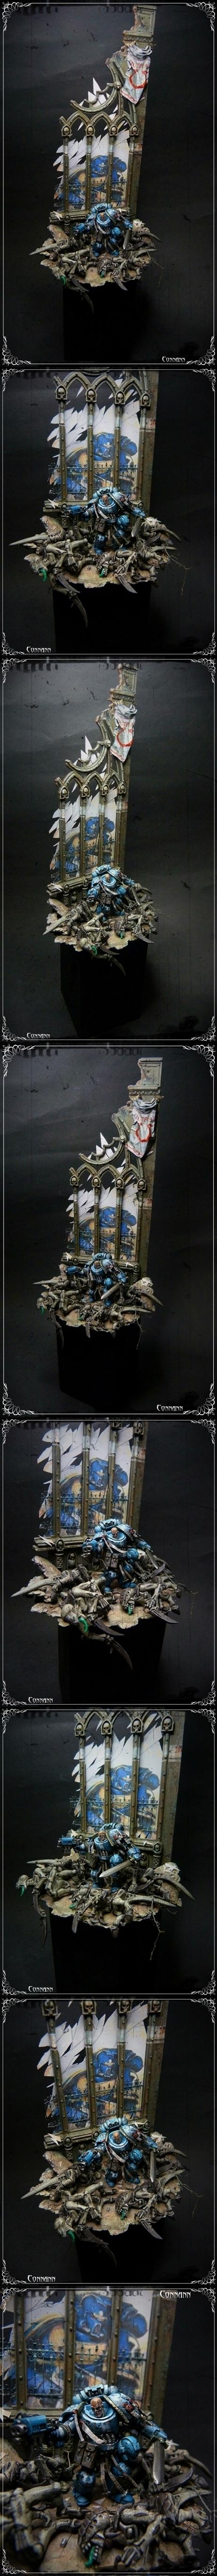 Terrain, Tyranids, Ultramarines, W40k, Warhammer 40,000